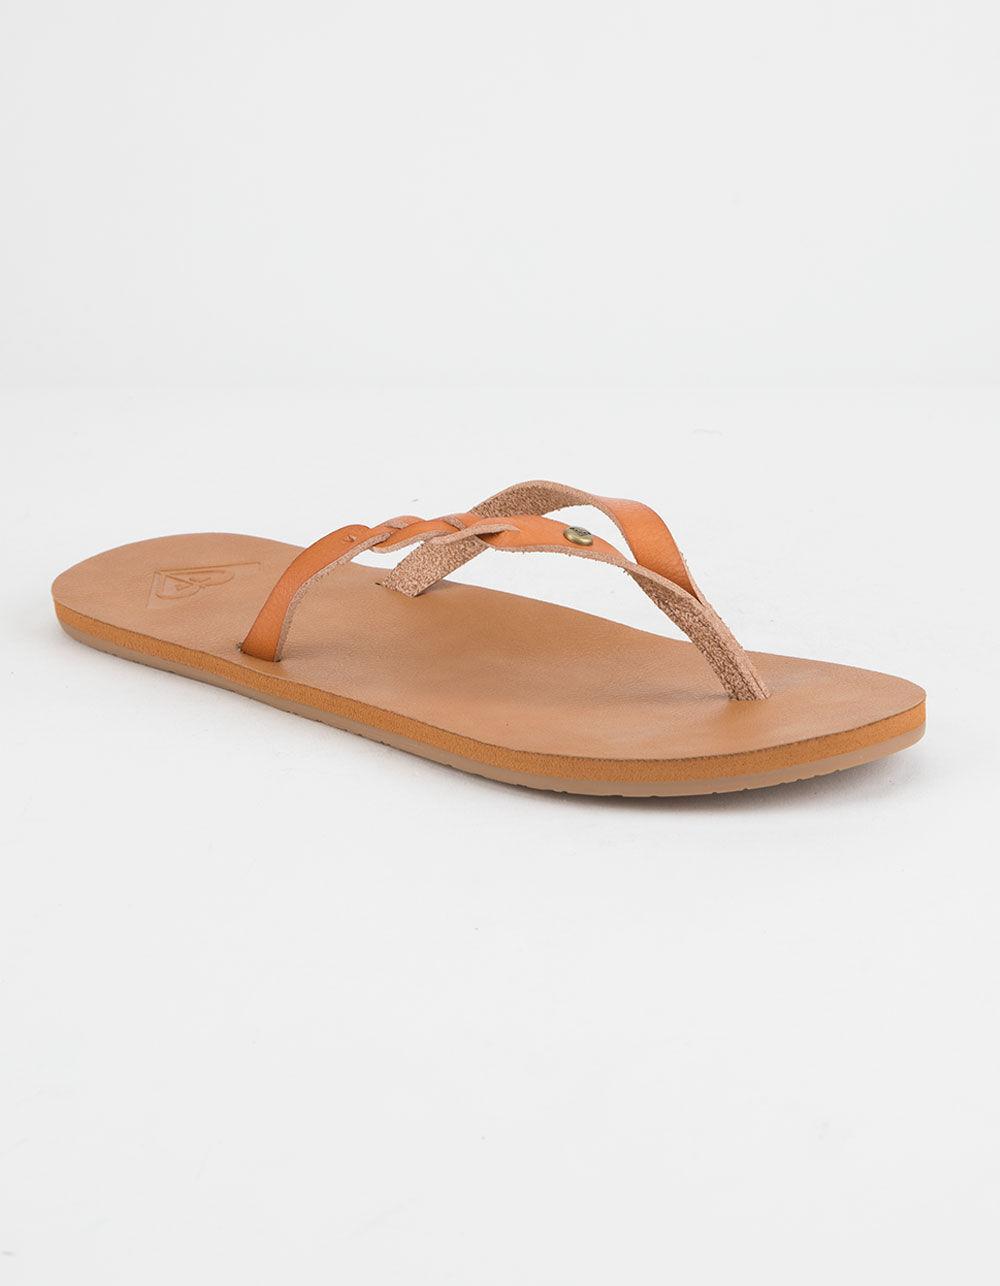 ROXY Liza II Sandals